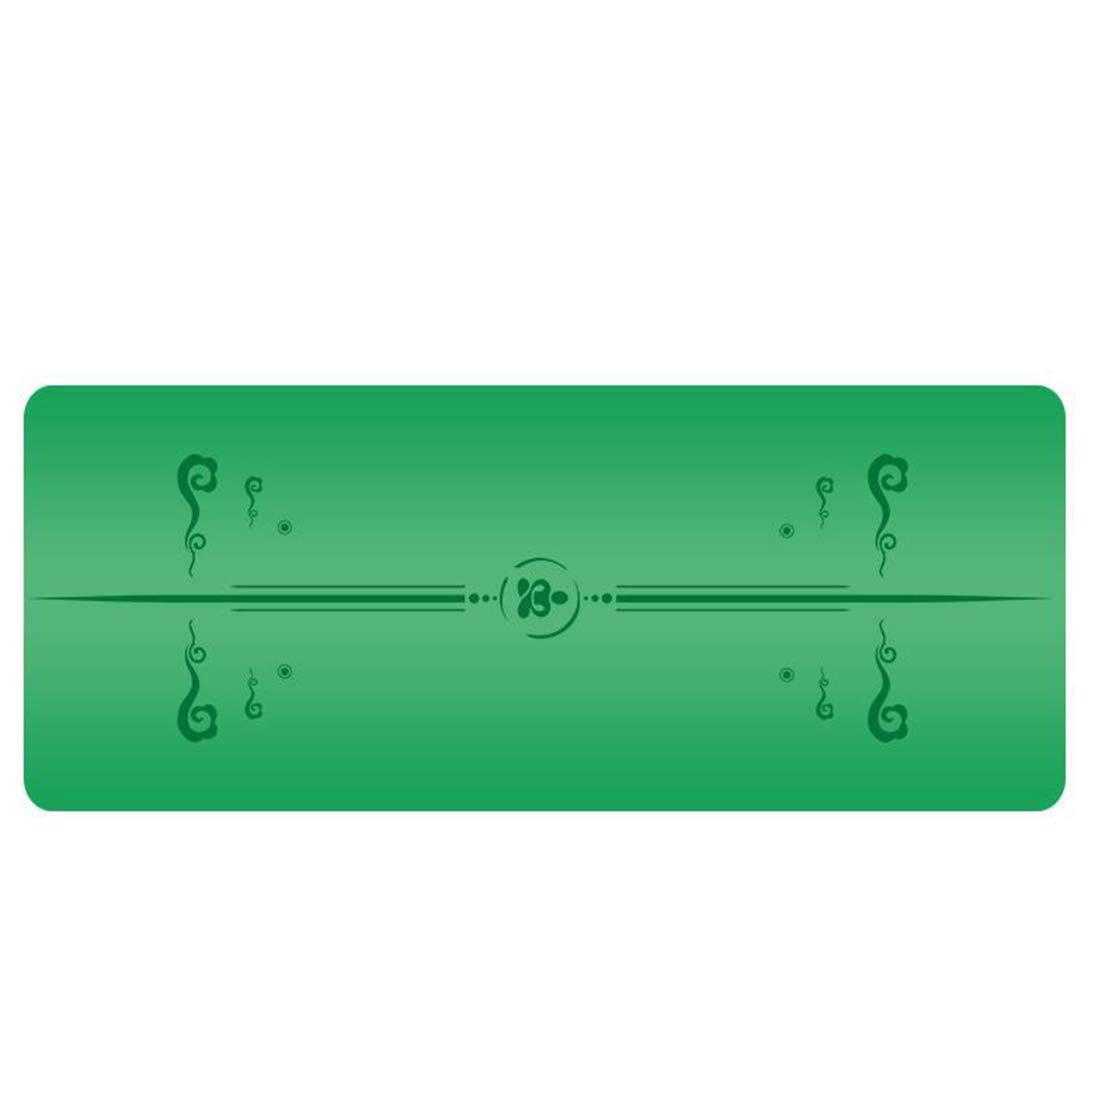 Koloeplf 健康とフィットネス万能の余分な厚い高密度抗涙運動泡ヨガマットストラップヨガマットを運ぶと (Color : ピンク, サイズ : 185cm*68cm*3mm) B07M8F4DTV 185cm*68cm*5mm|オレンジ オレンジ 185cm*68cm*5mm